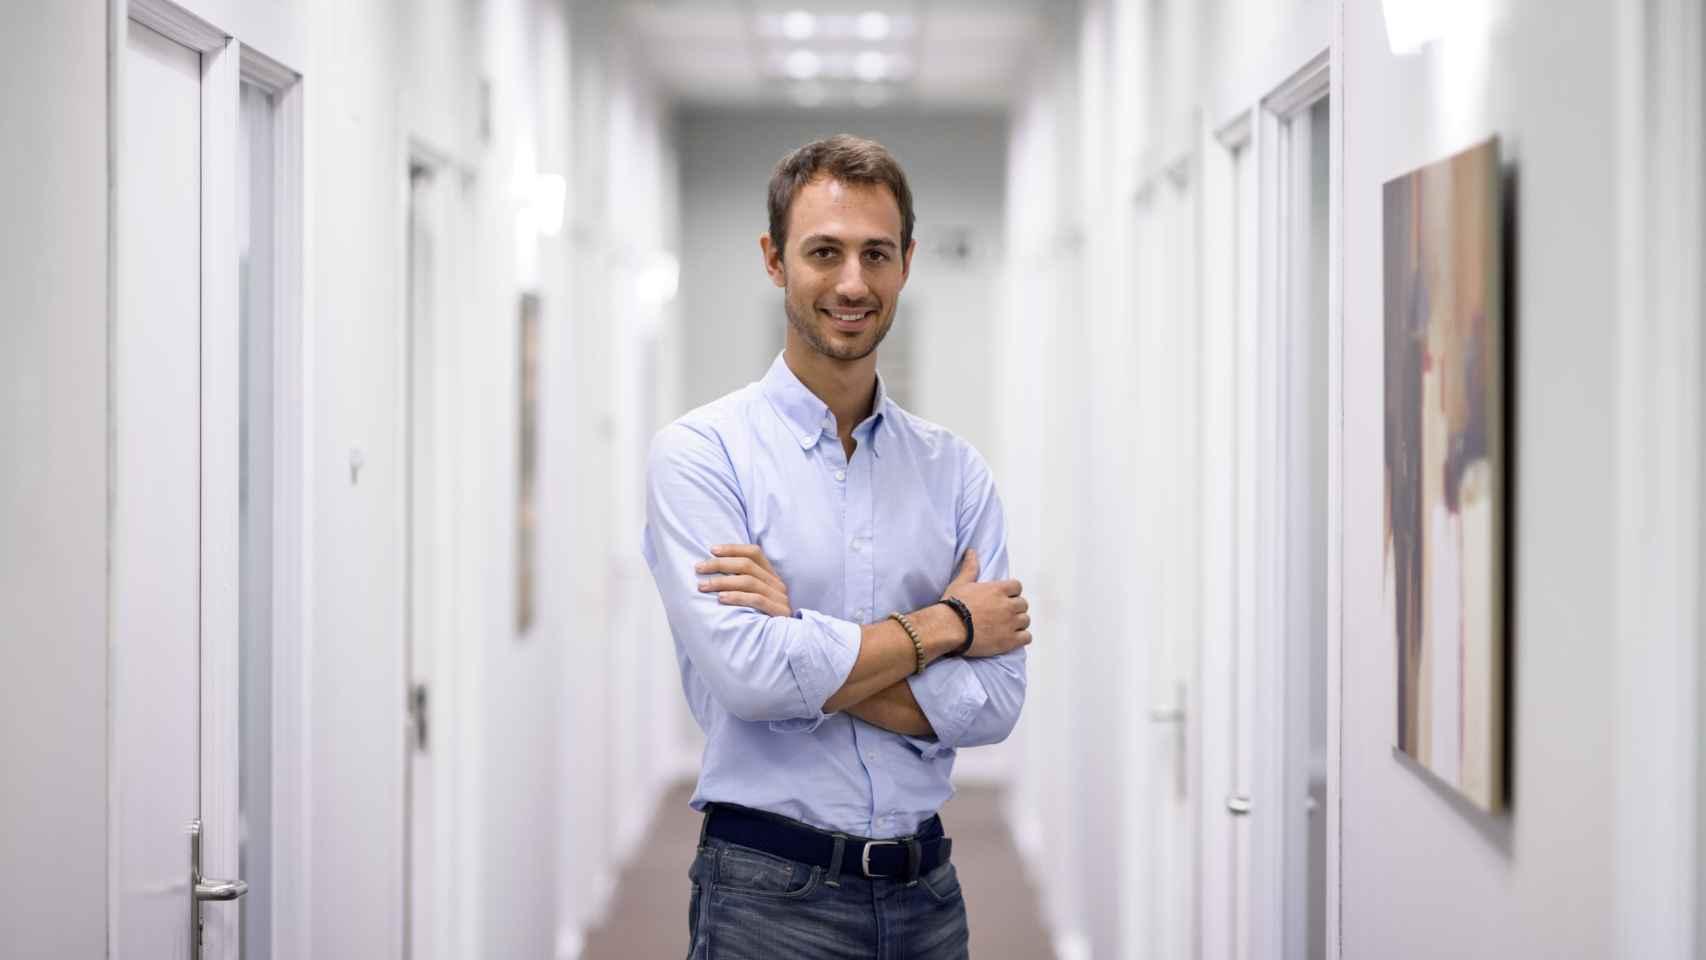 Jaime Rodríguez, máximo dirigente de BlaBlaCar en España.